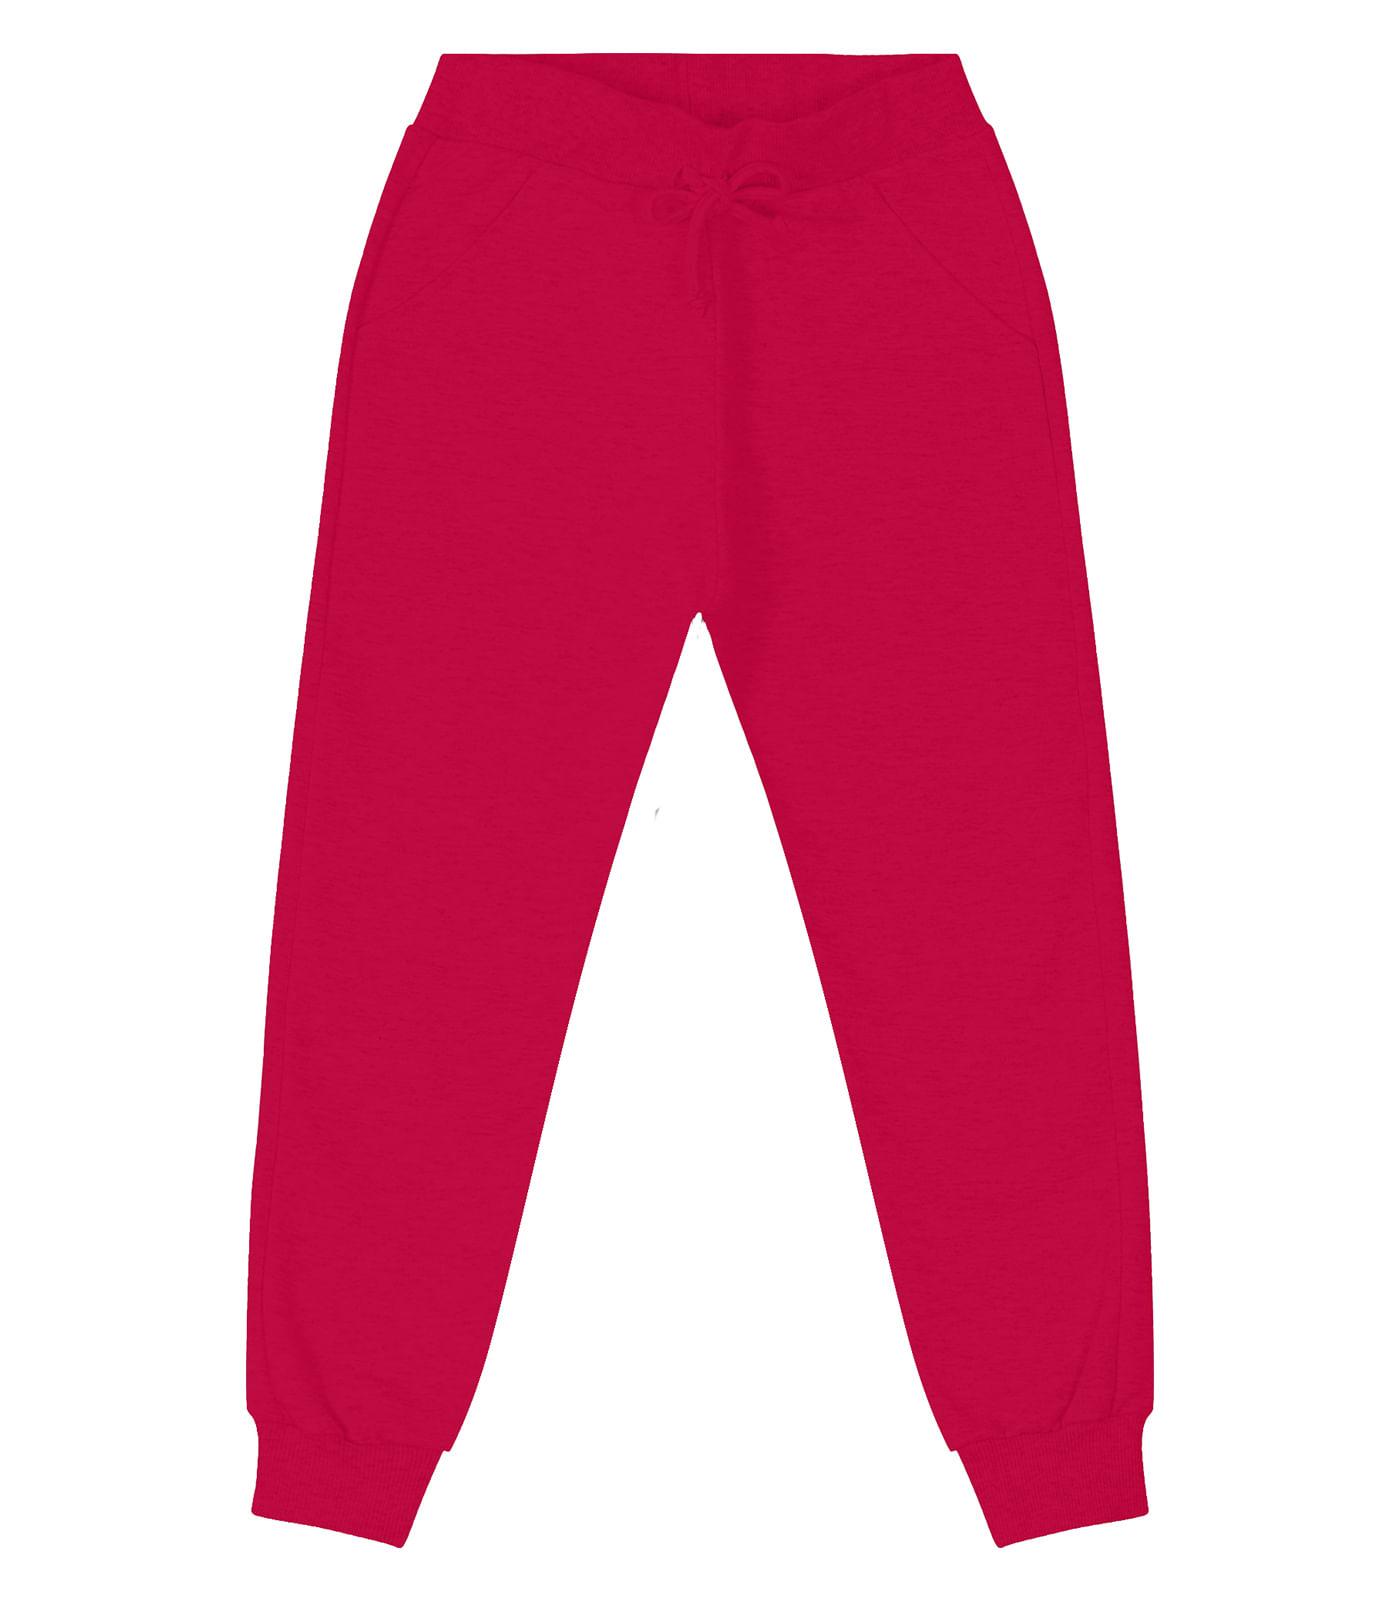 Calca-Basica-Feminina-Rovitex-Vermelho